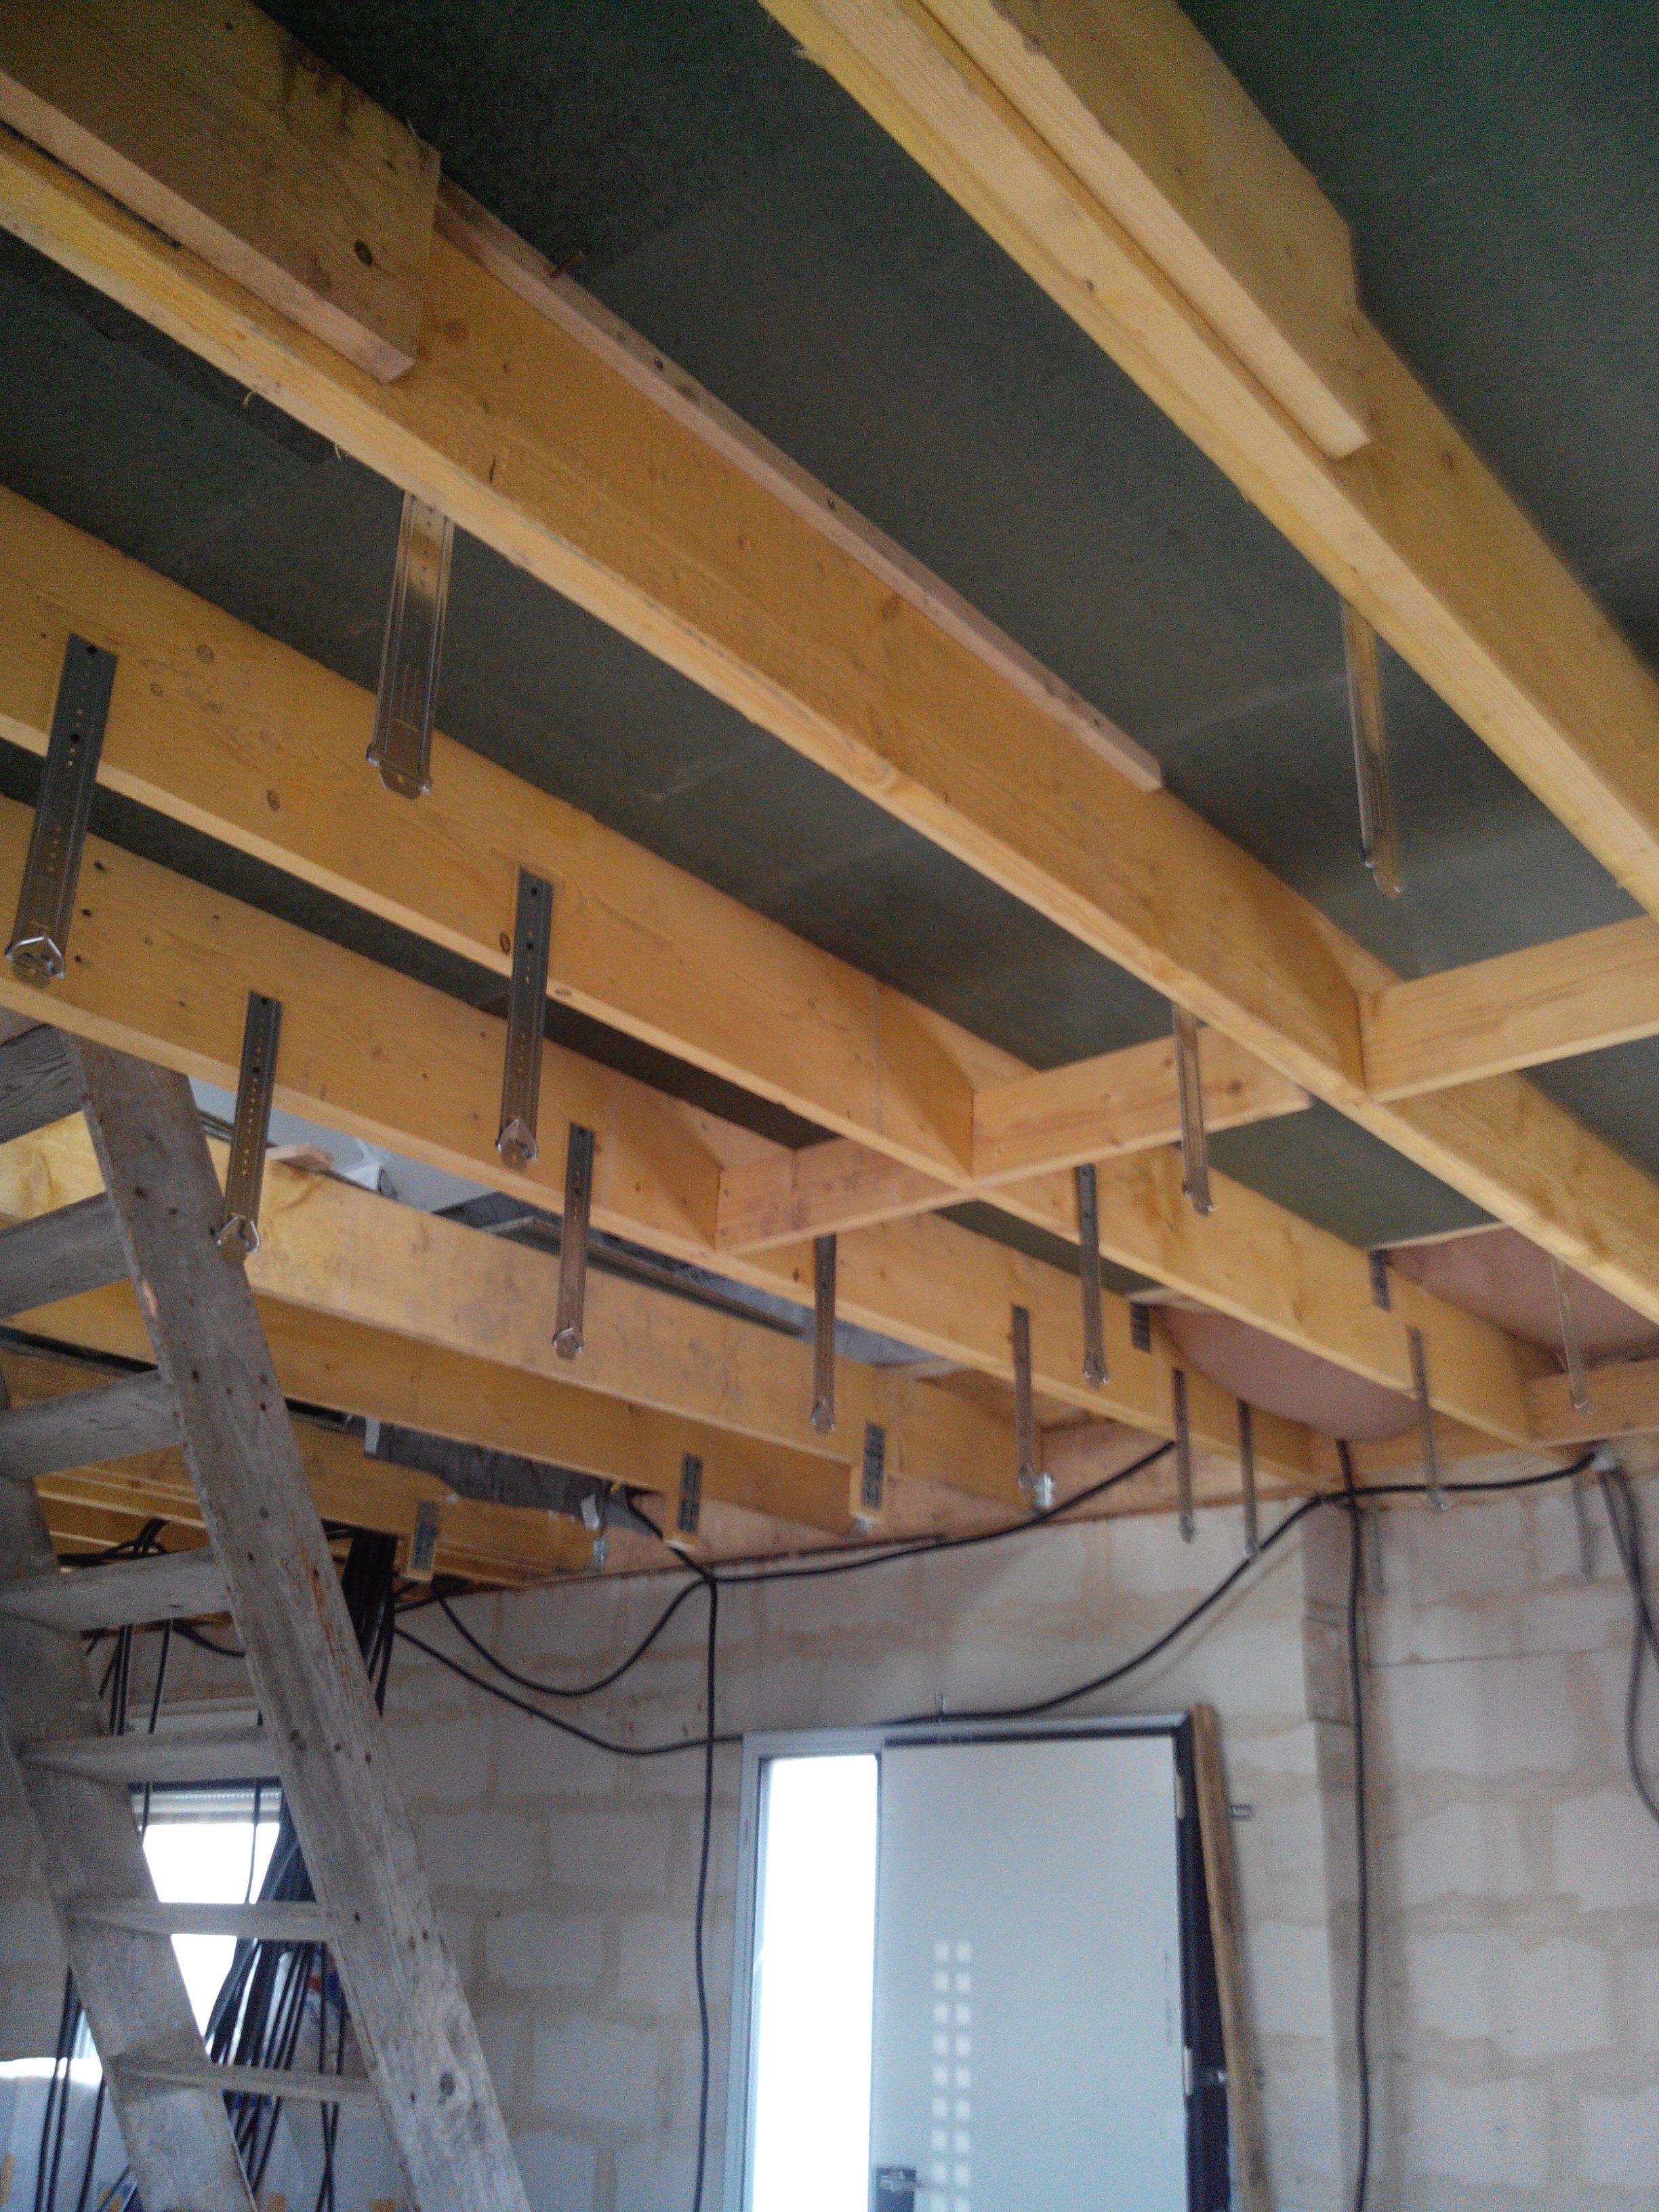 isolation du plancher closcouvert62. Black Bedroom Furniture Sets. Home Design Ideas